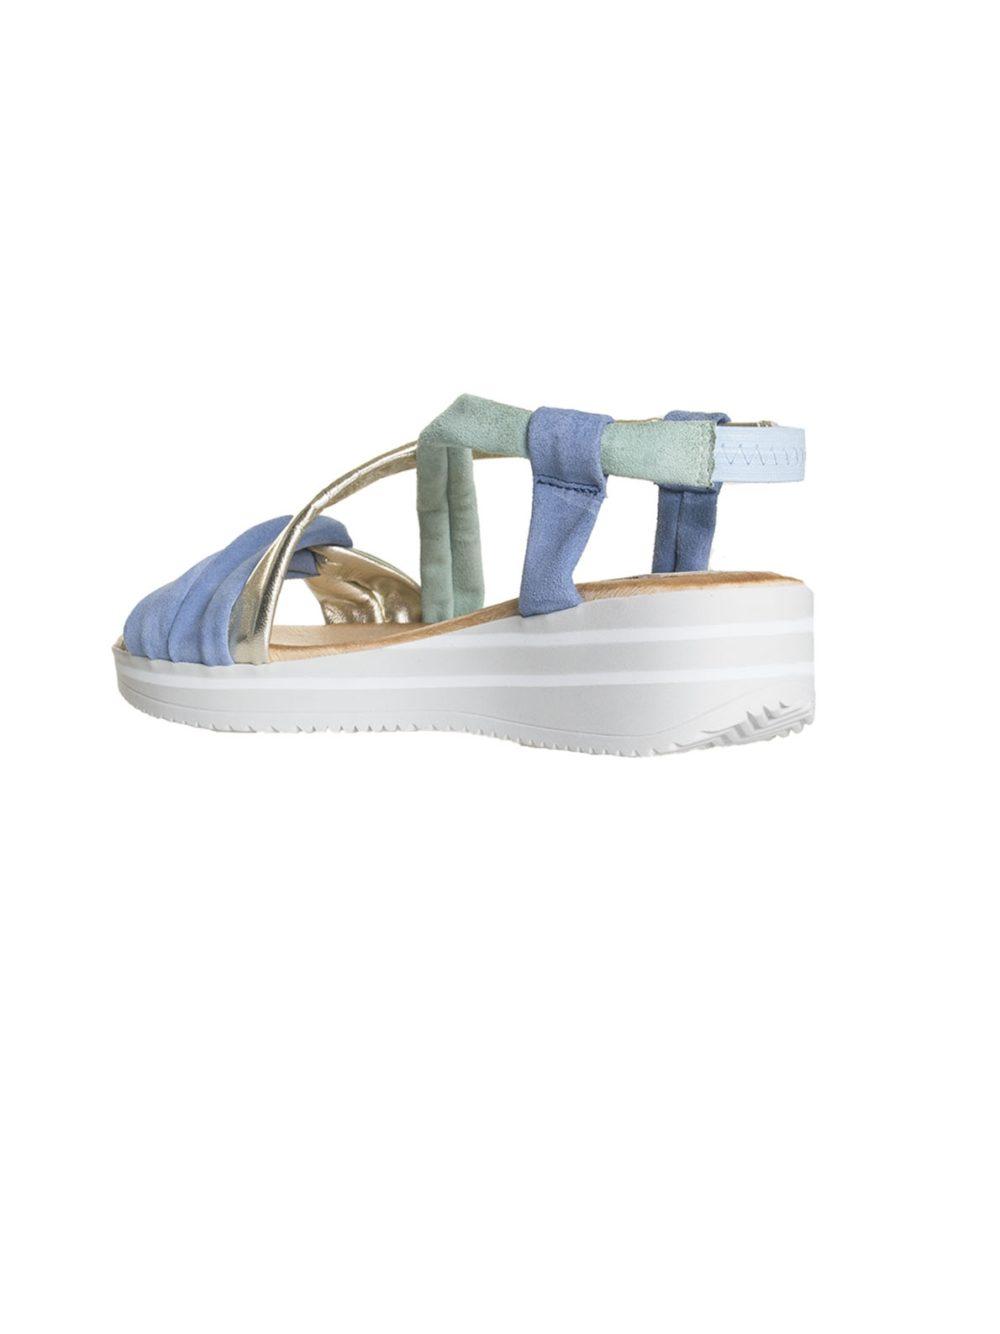 Lujan Gris Sandal Marila Shoes Katie Kerr Women's Clothing